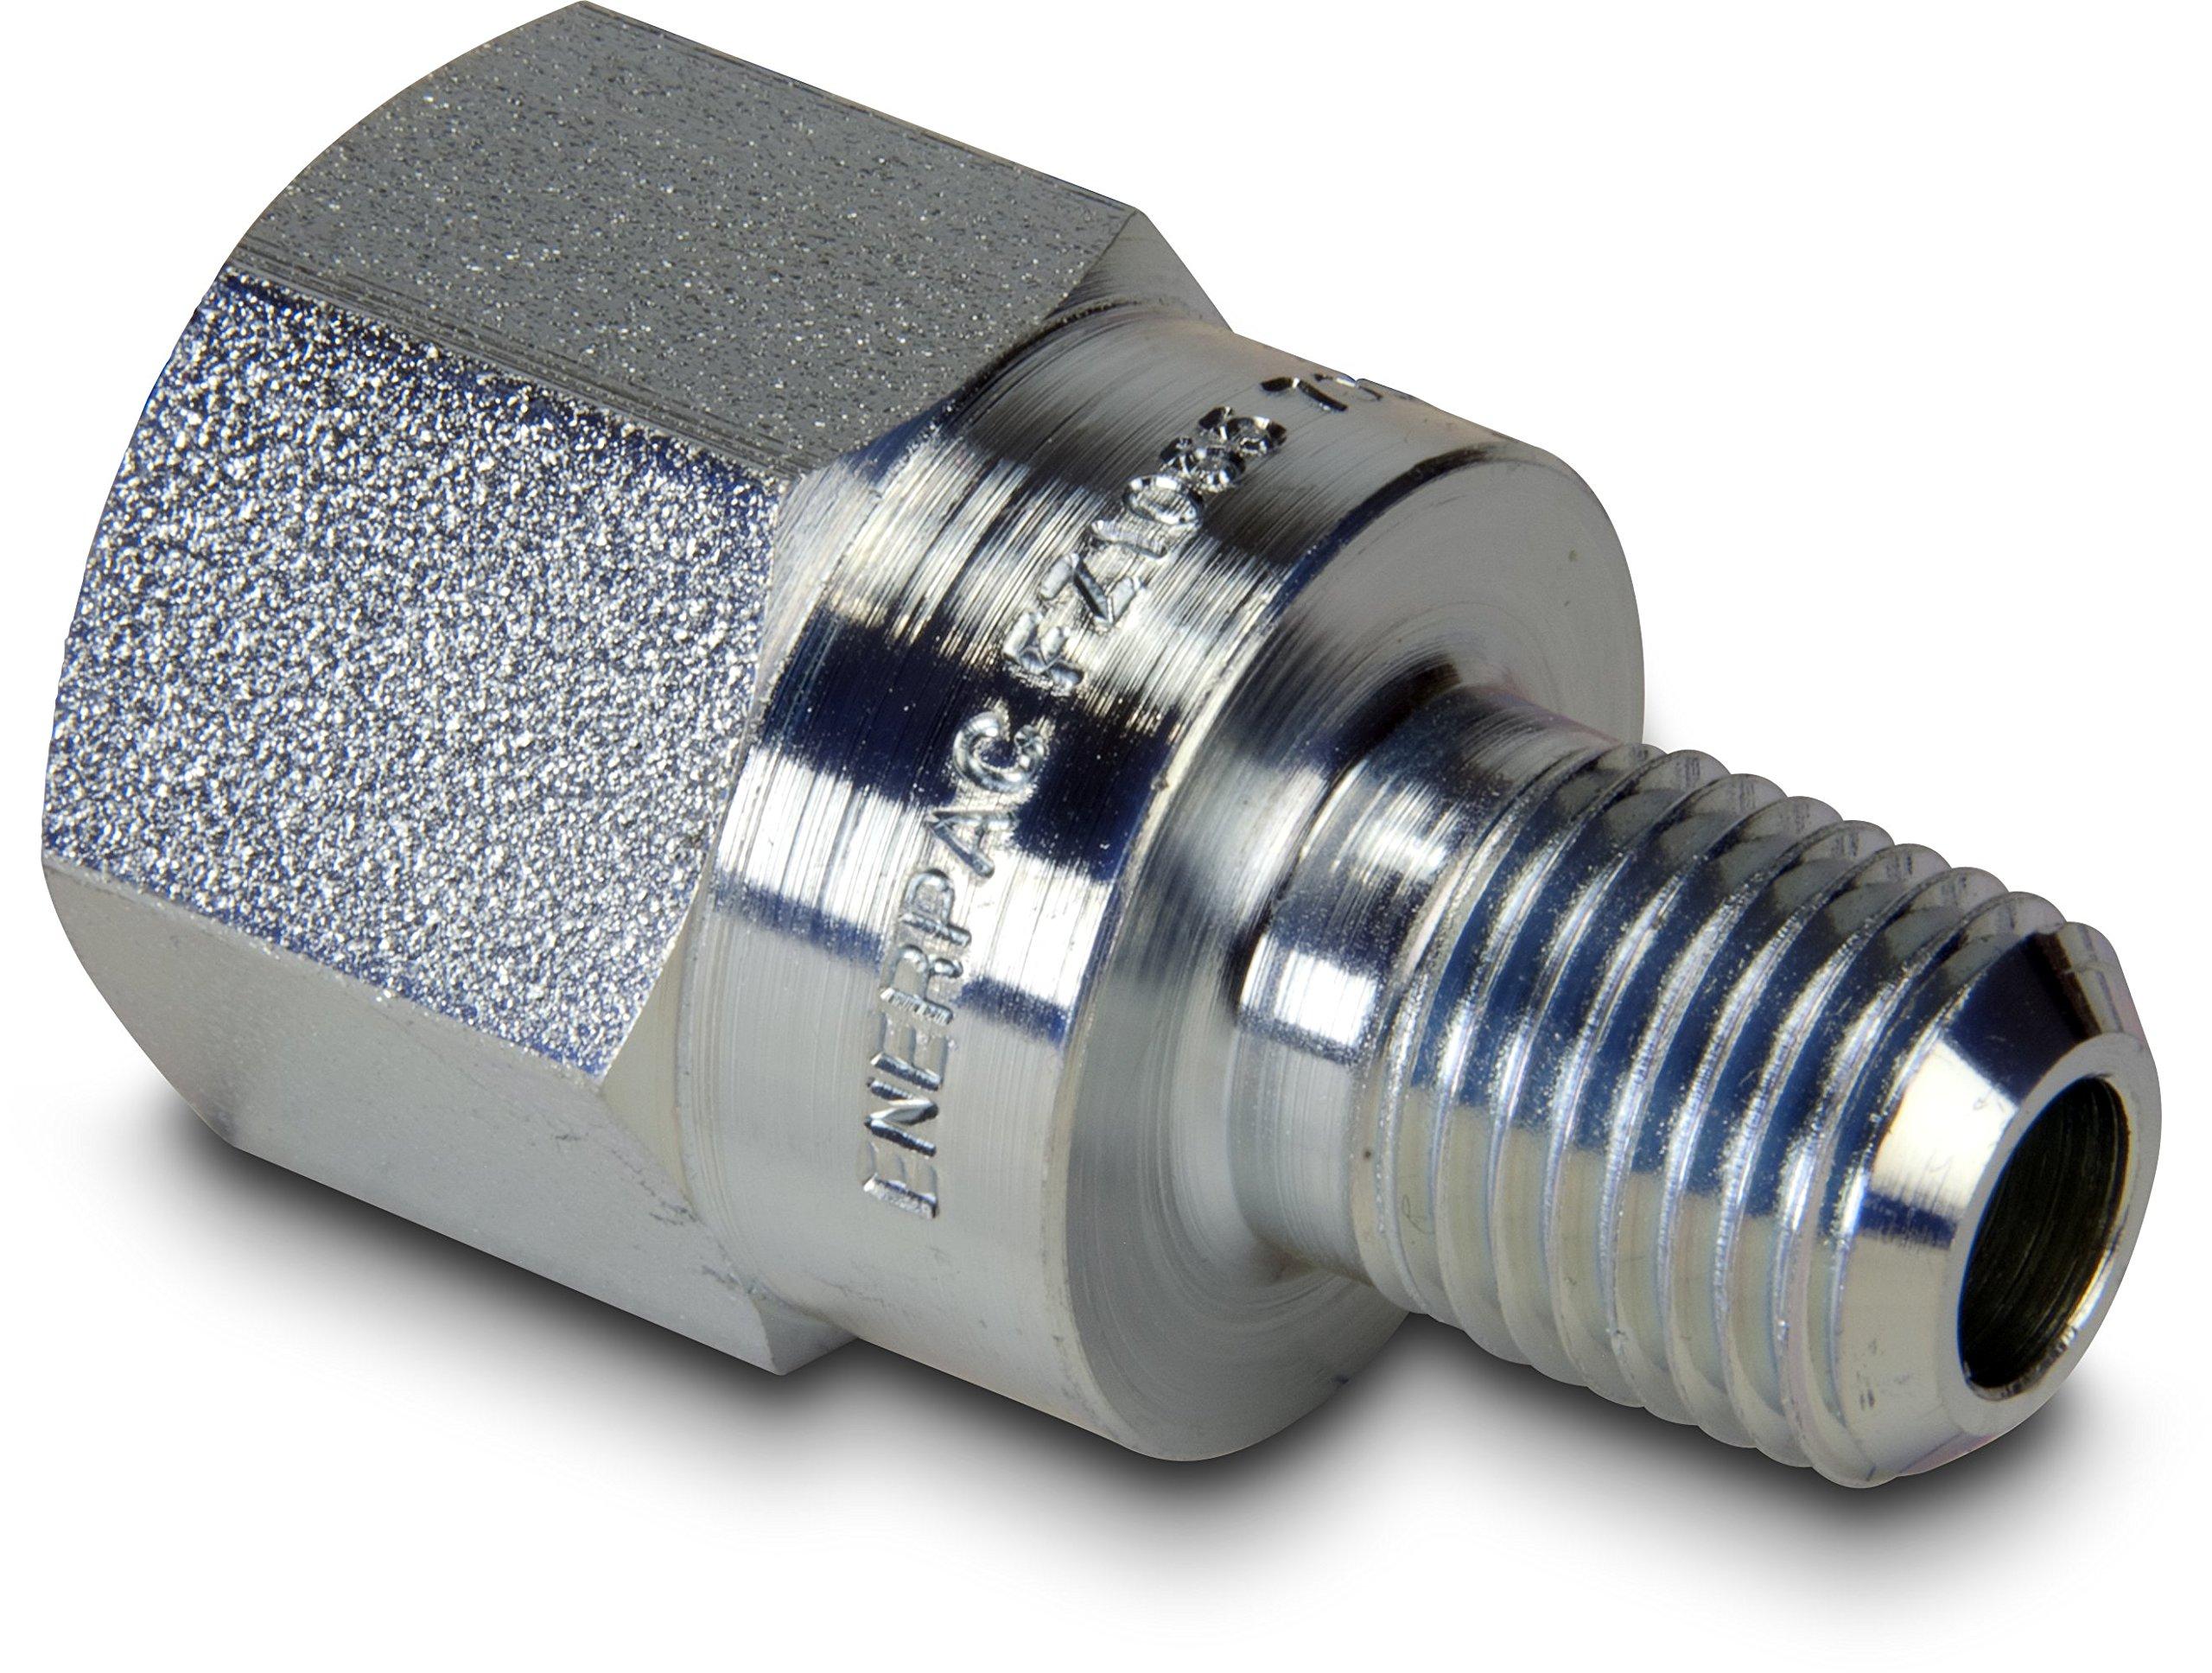 Enerpac FZ1055 Adaptor Fitting, 3/8''-18 NPTF Female, 1/4''-18 NPTF Male